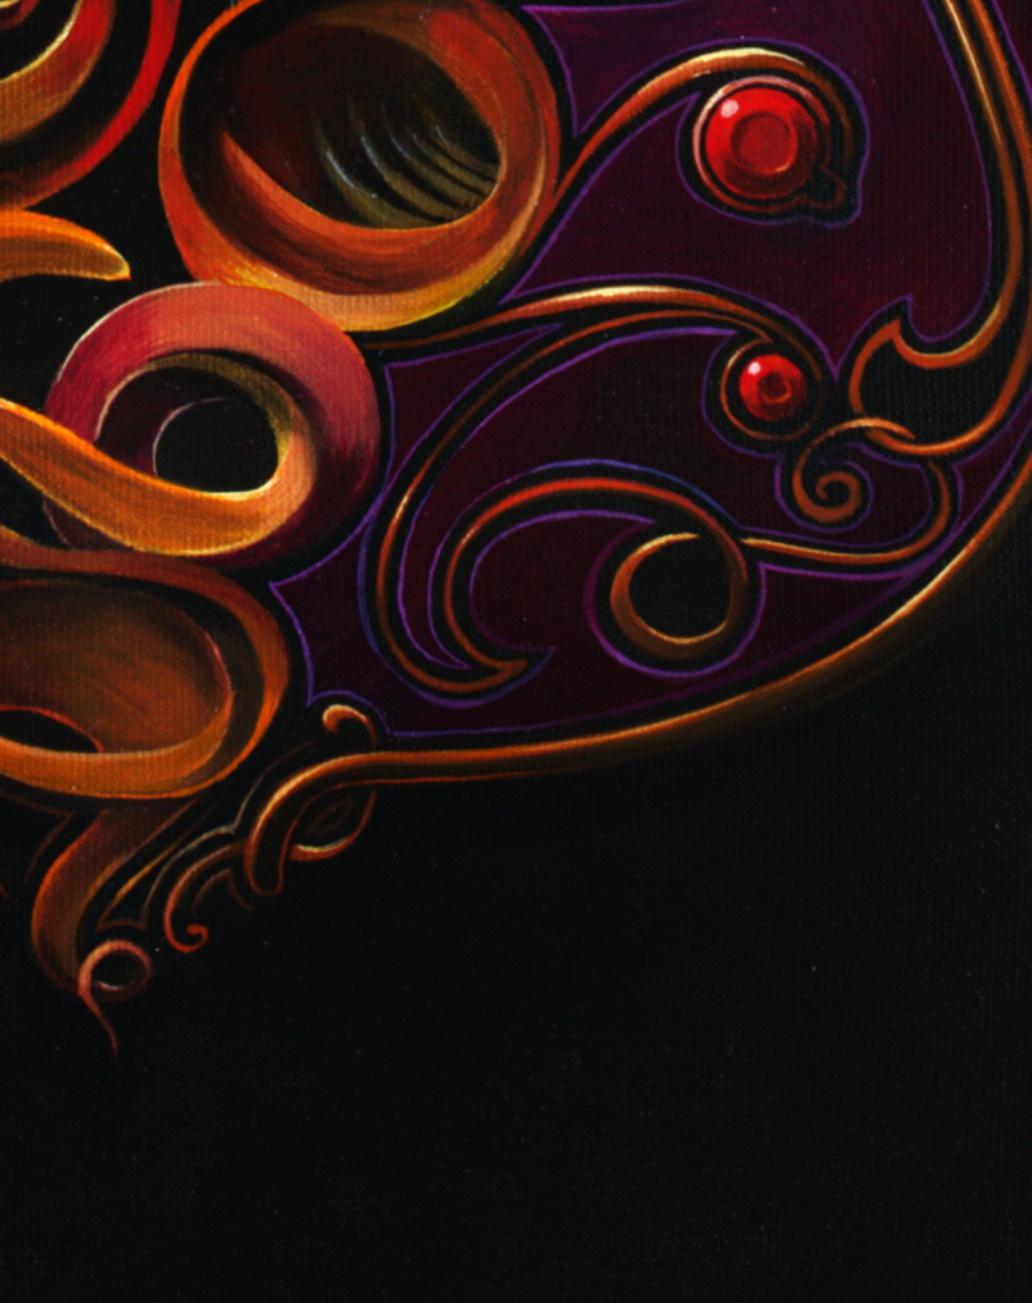 ART_paint_Mangione_03